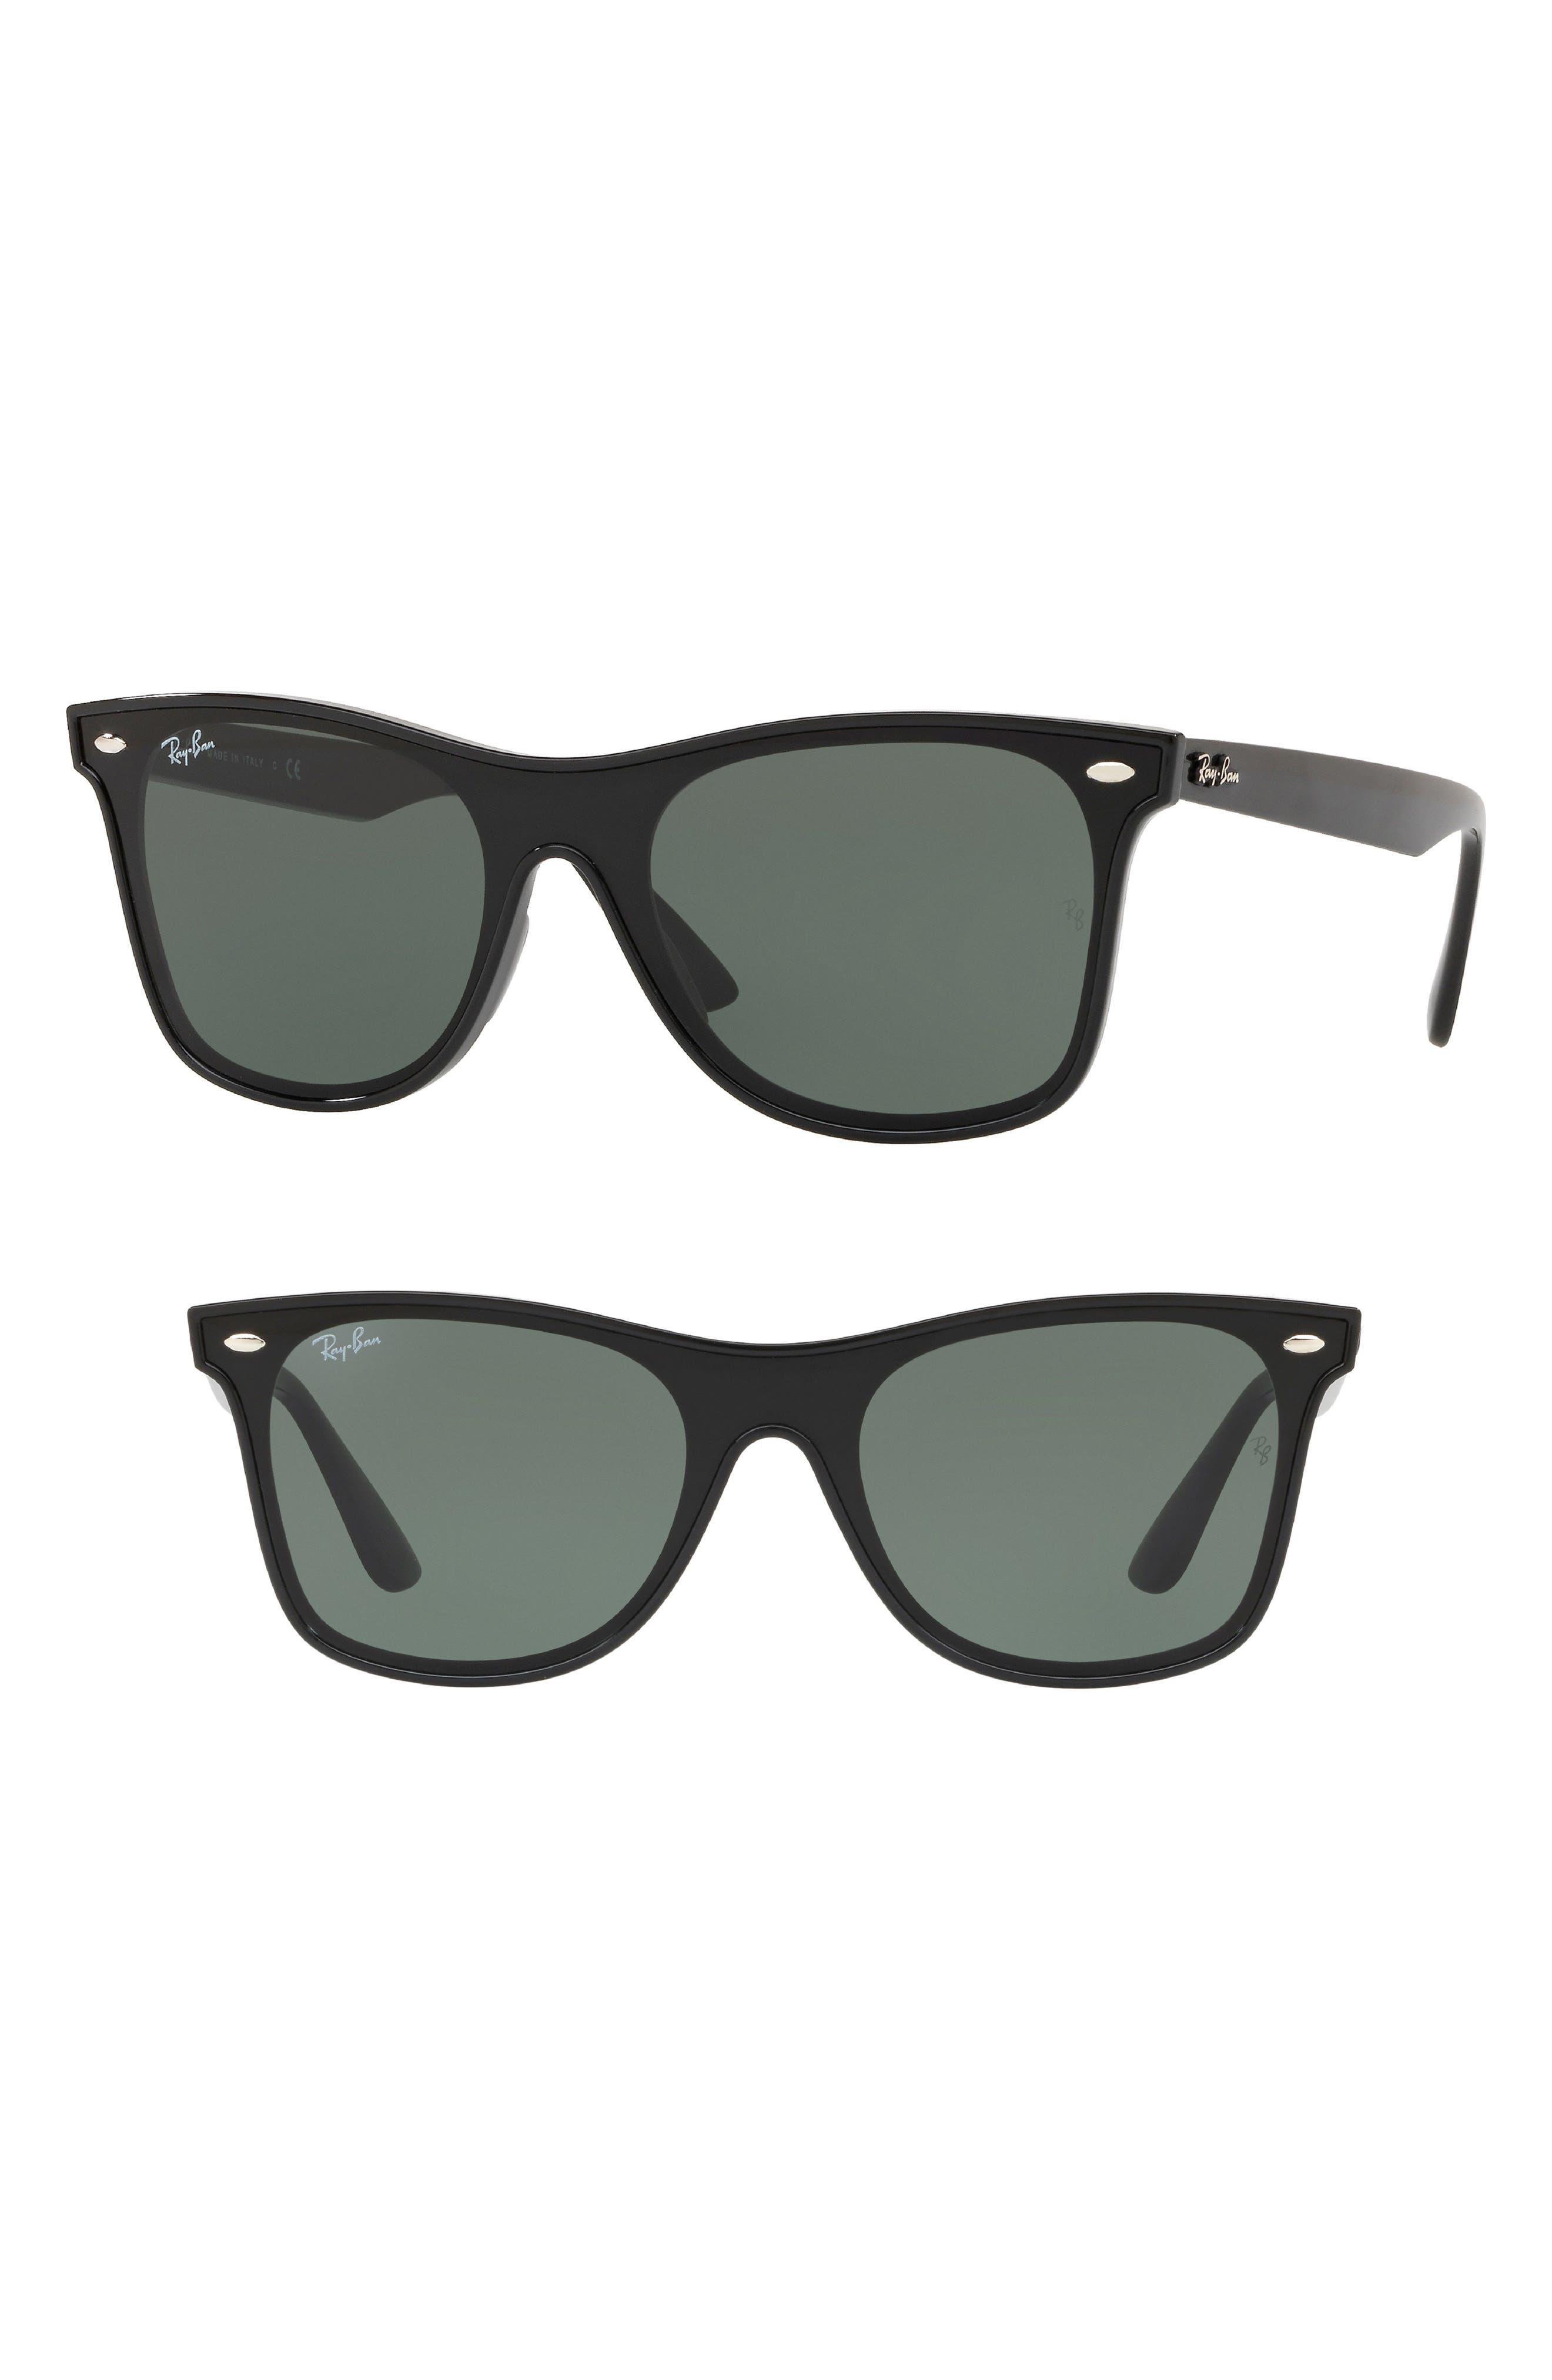 Blaze 41mm Wayfarer Sunglasses,                         Main,                         color, BLACK SOLID